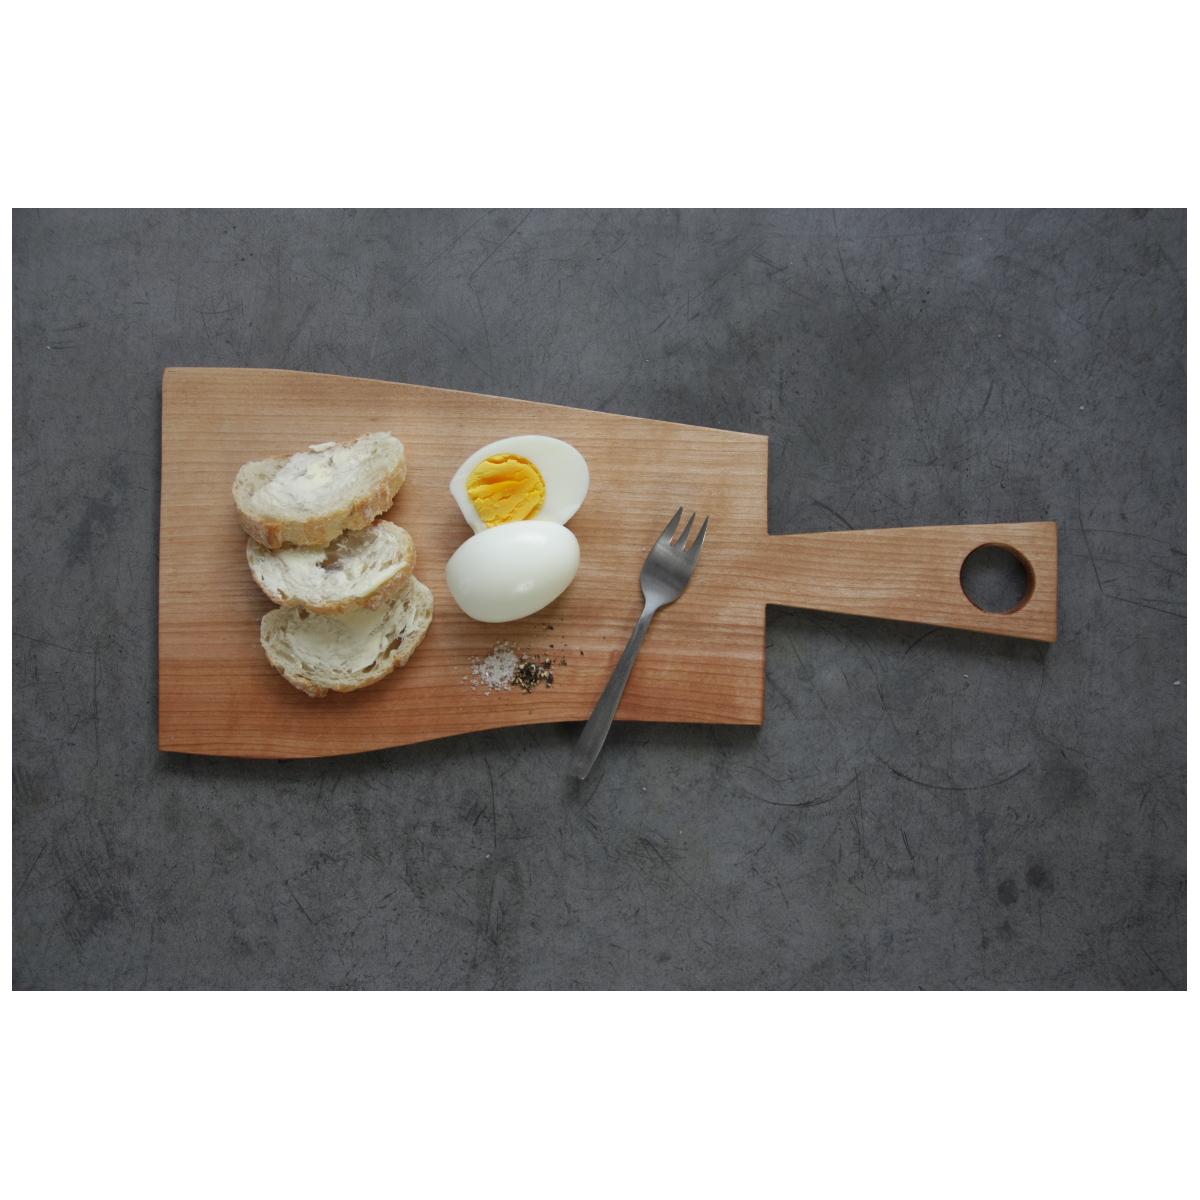 JK Custom Furniture — Berkshires: Cheese Board